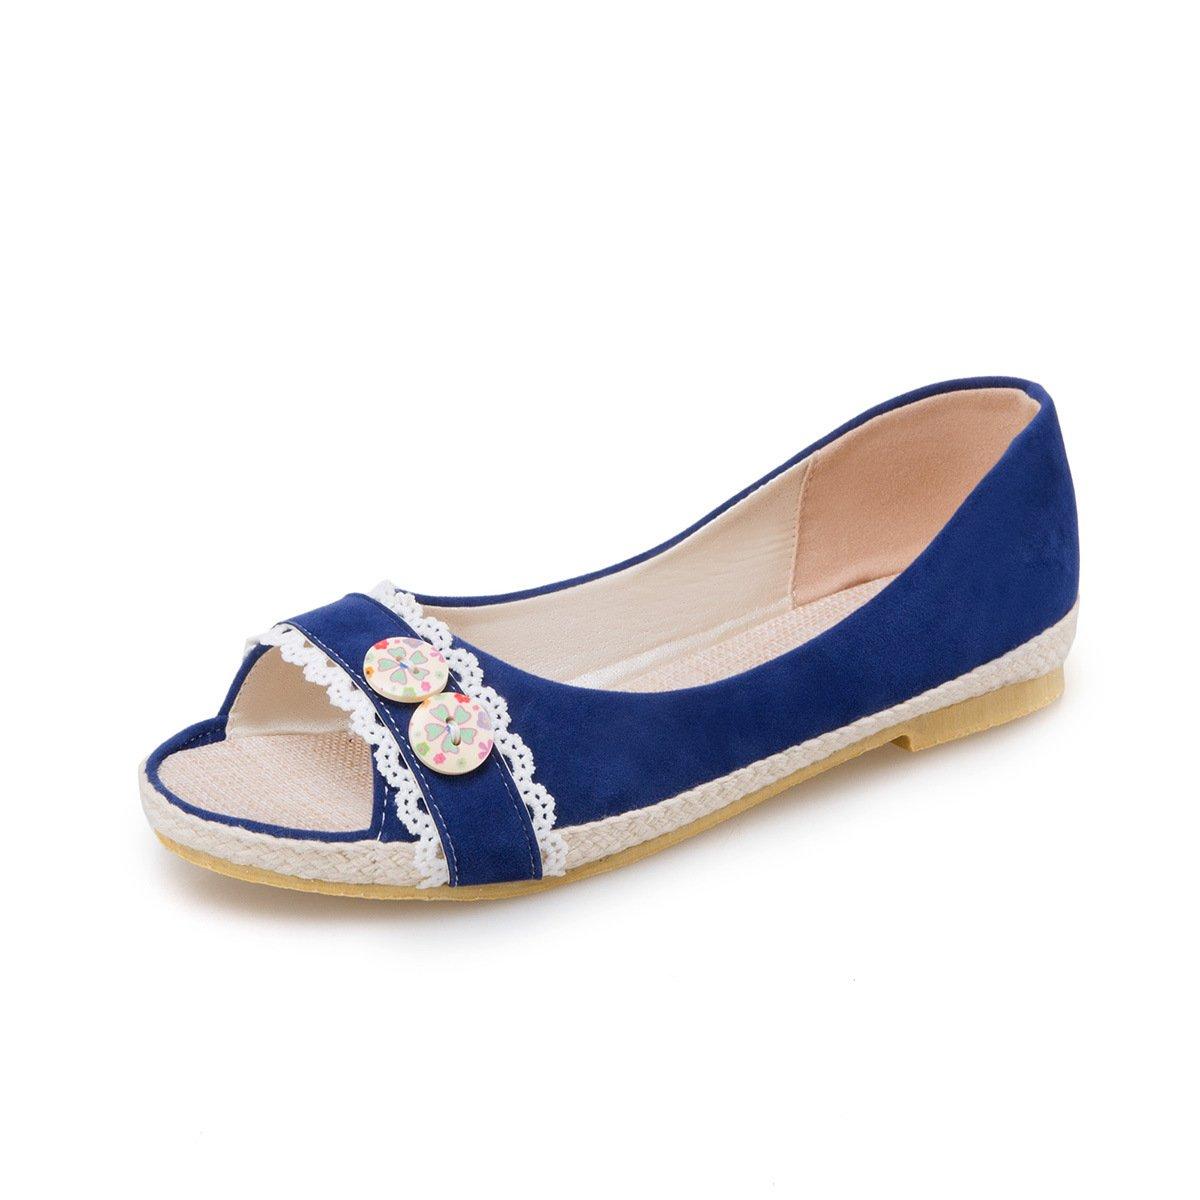 QIN&X Damen Casual Flachem Absatz Peep Toe Sandalen Sandalen Toe Blau adaa5b